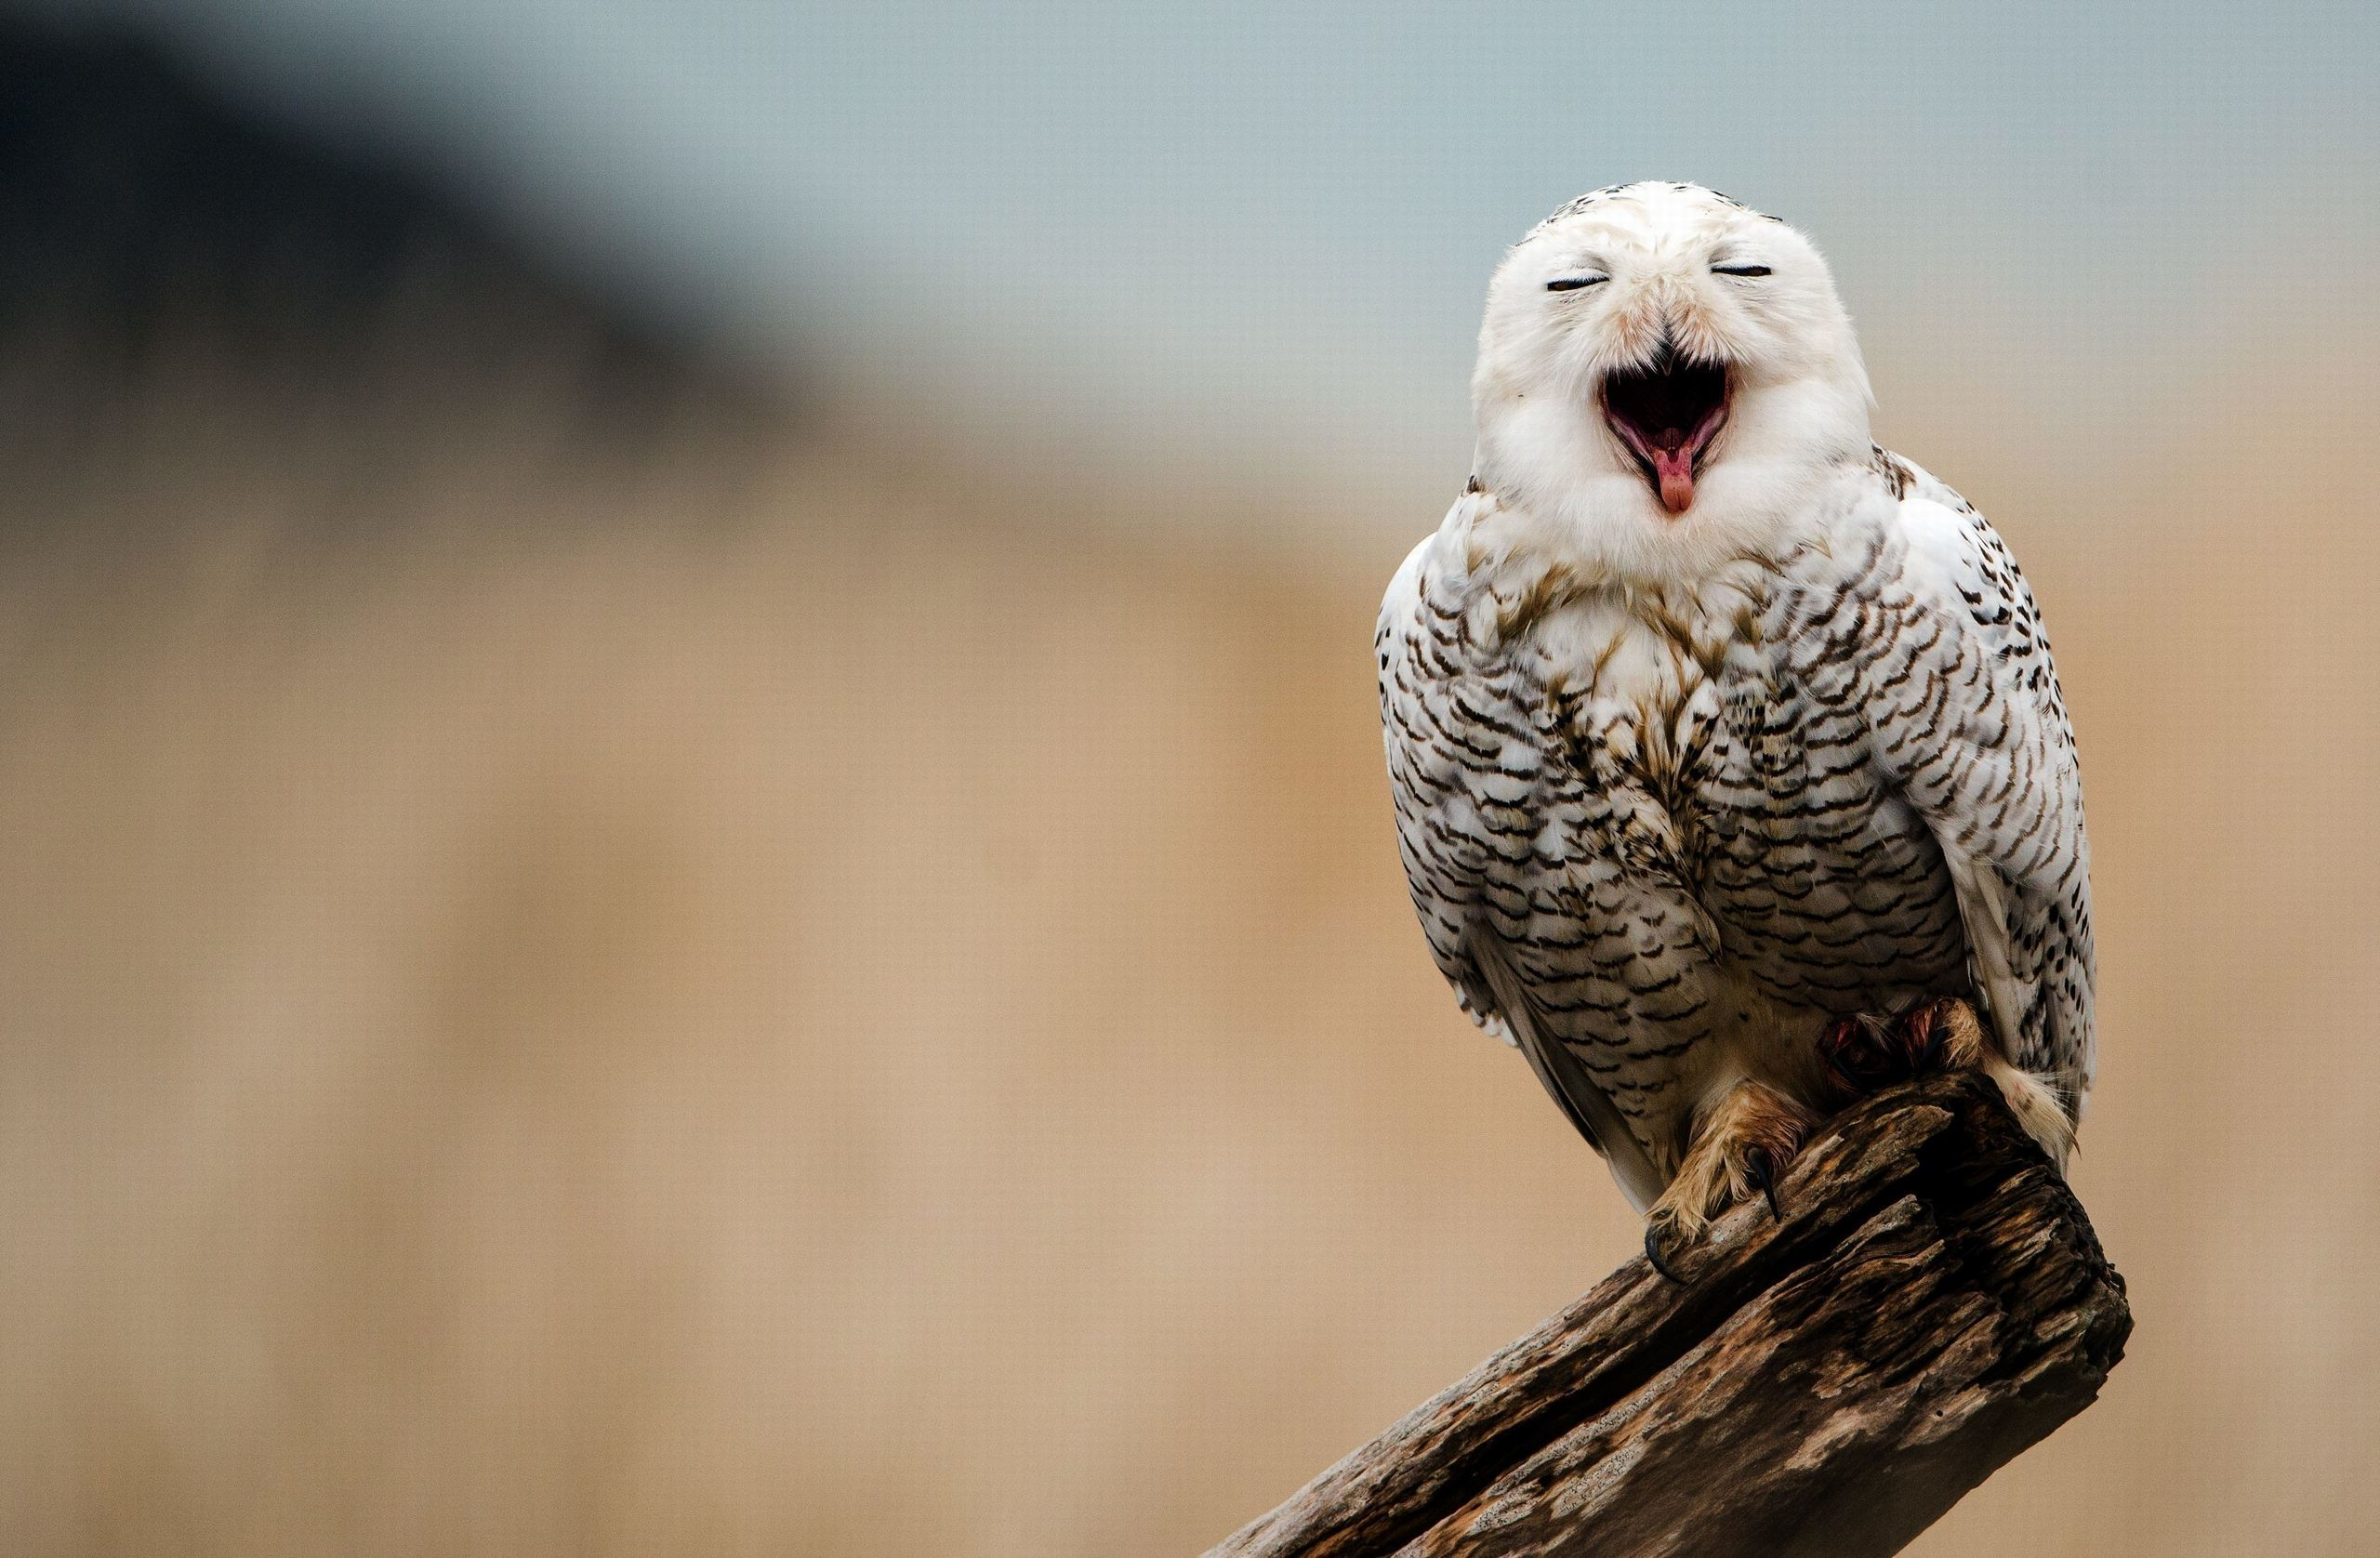 Snowy Owl Wallpaper Full HD